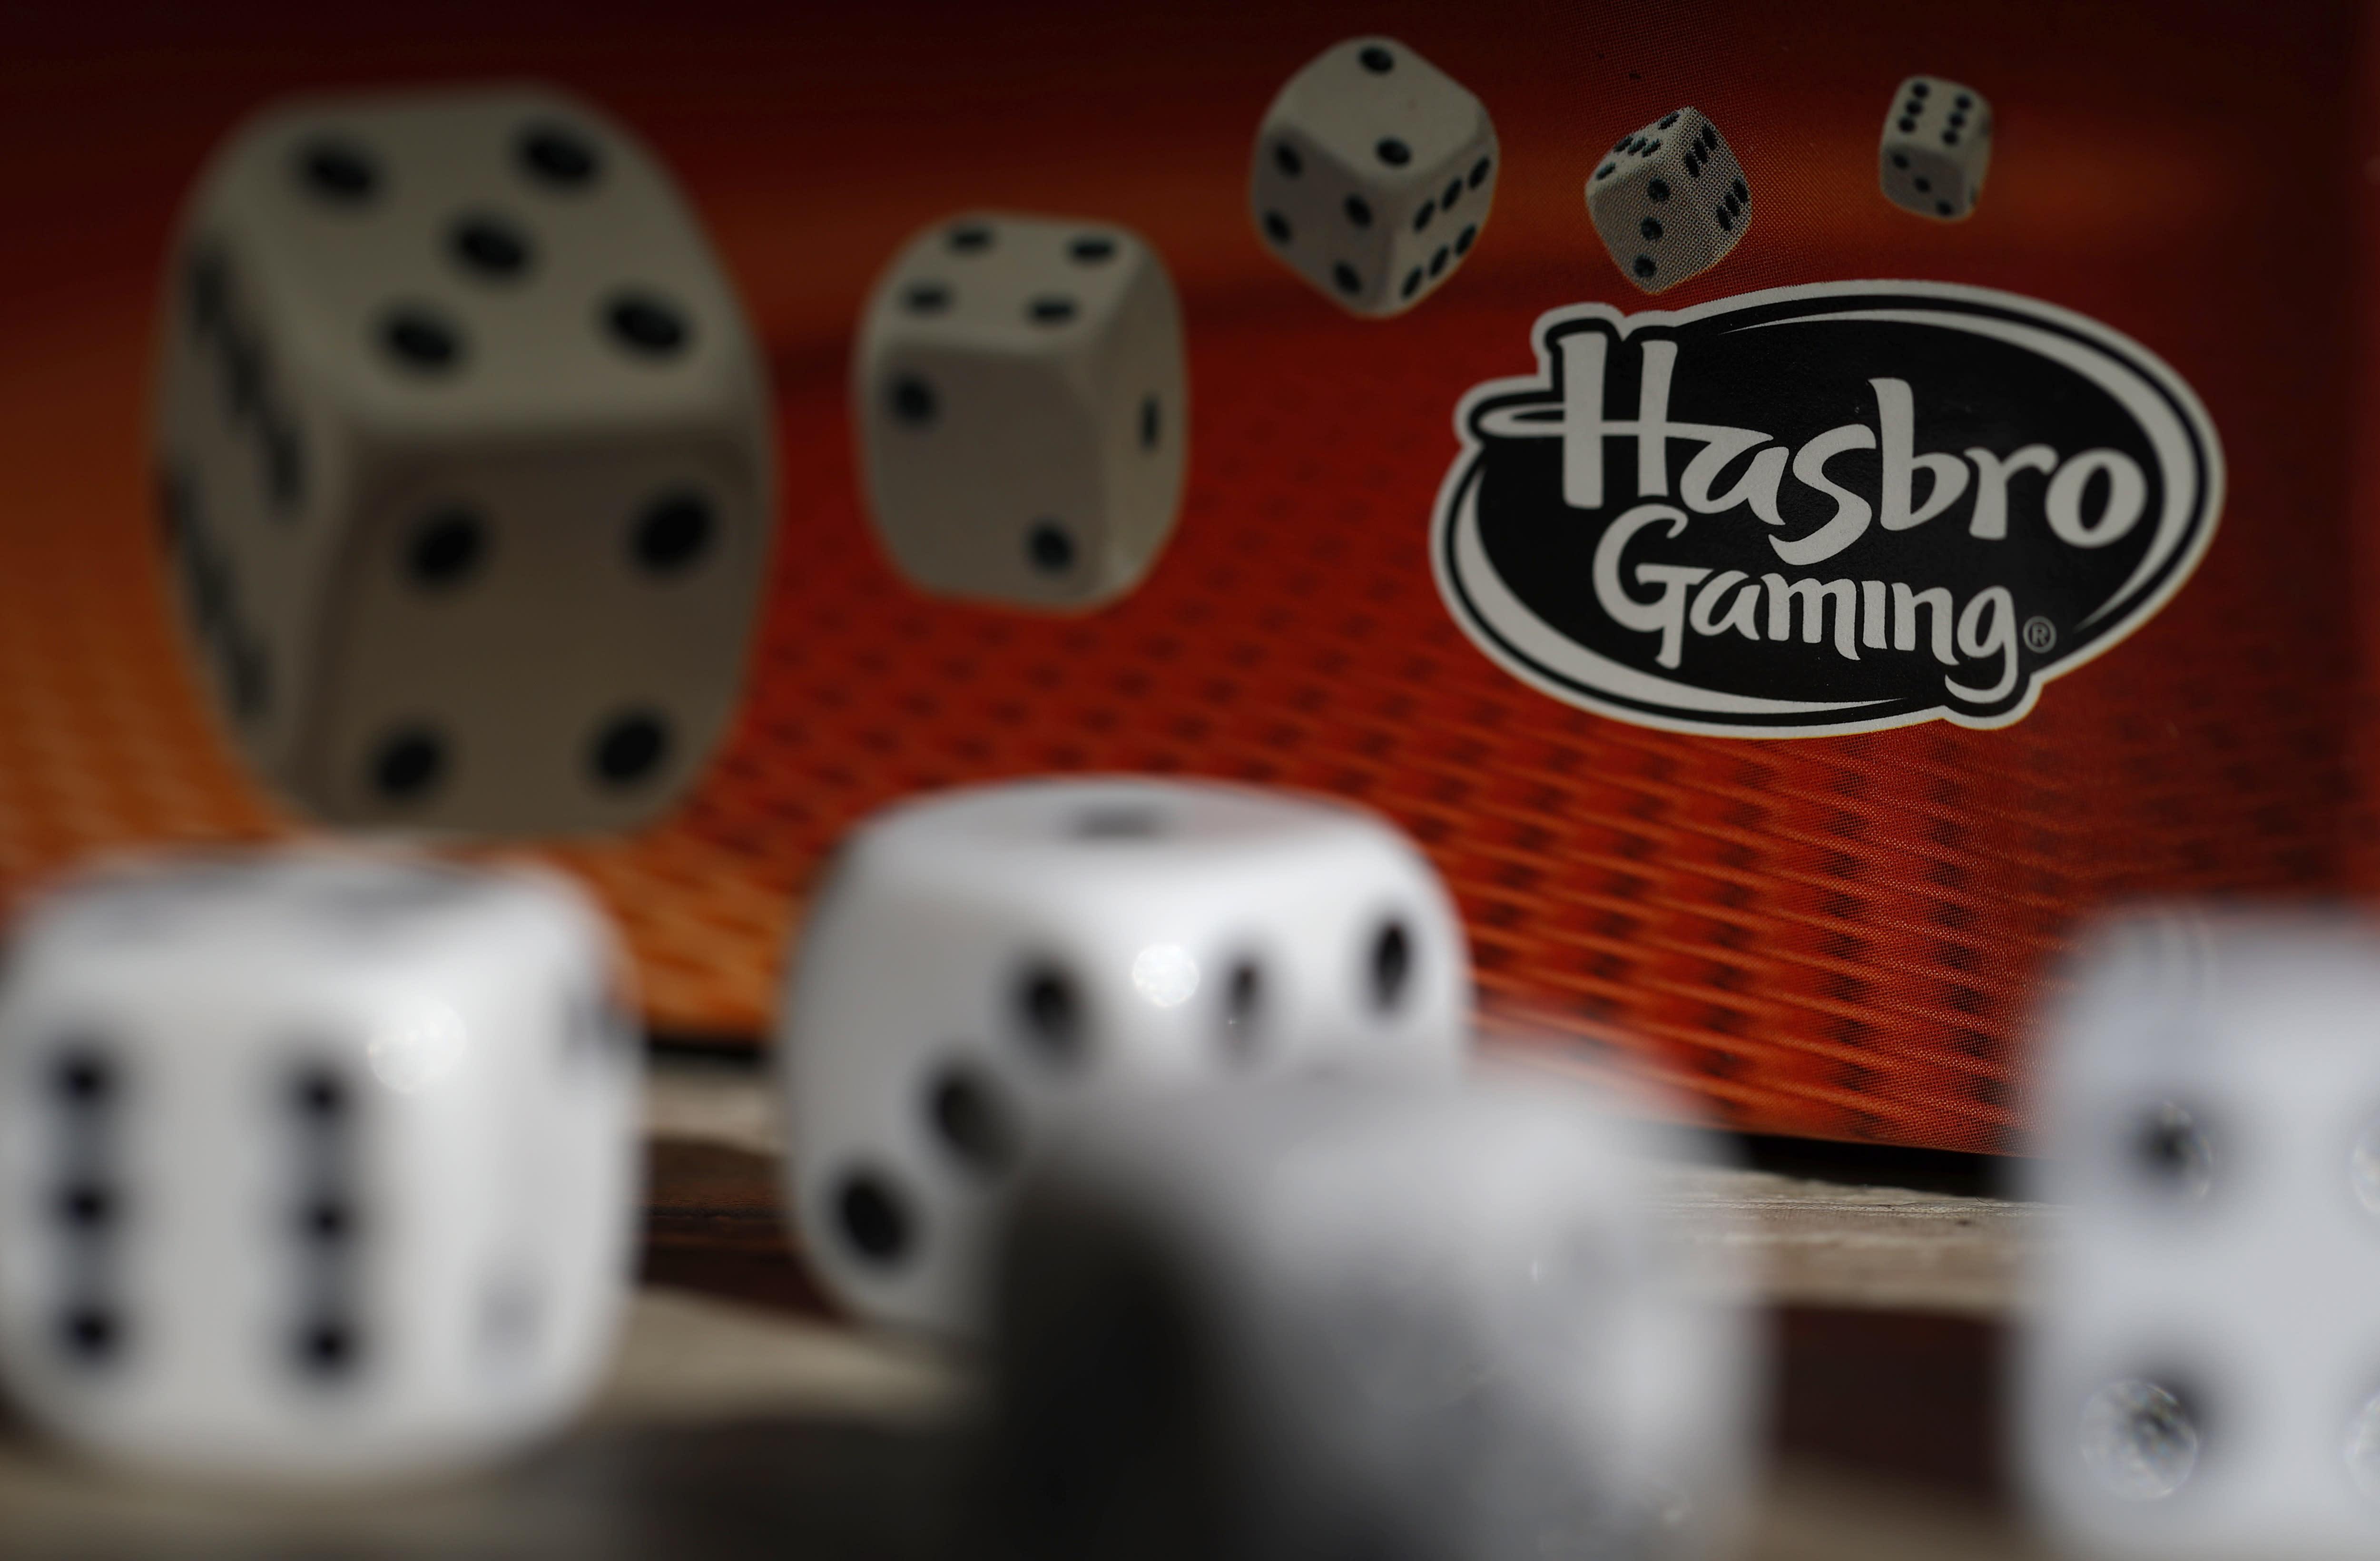 Stocks making the biggest moves premarket: Hasbro, Otis Worldwide, Lockheed Martin and others